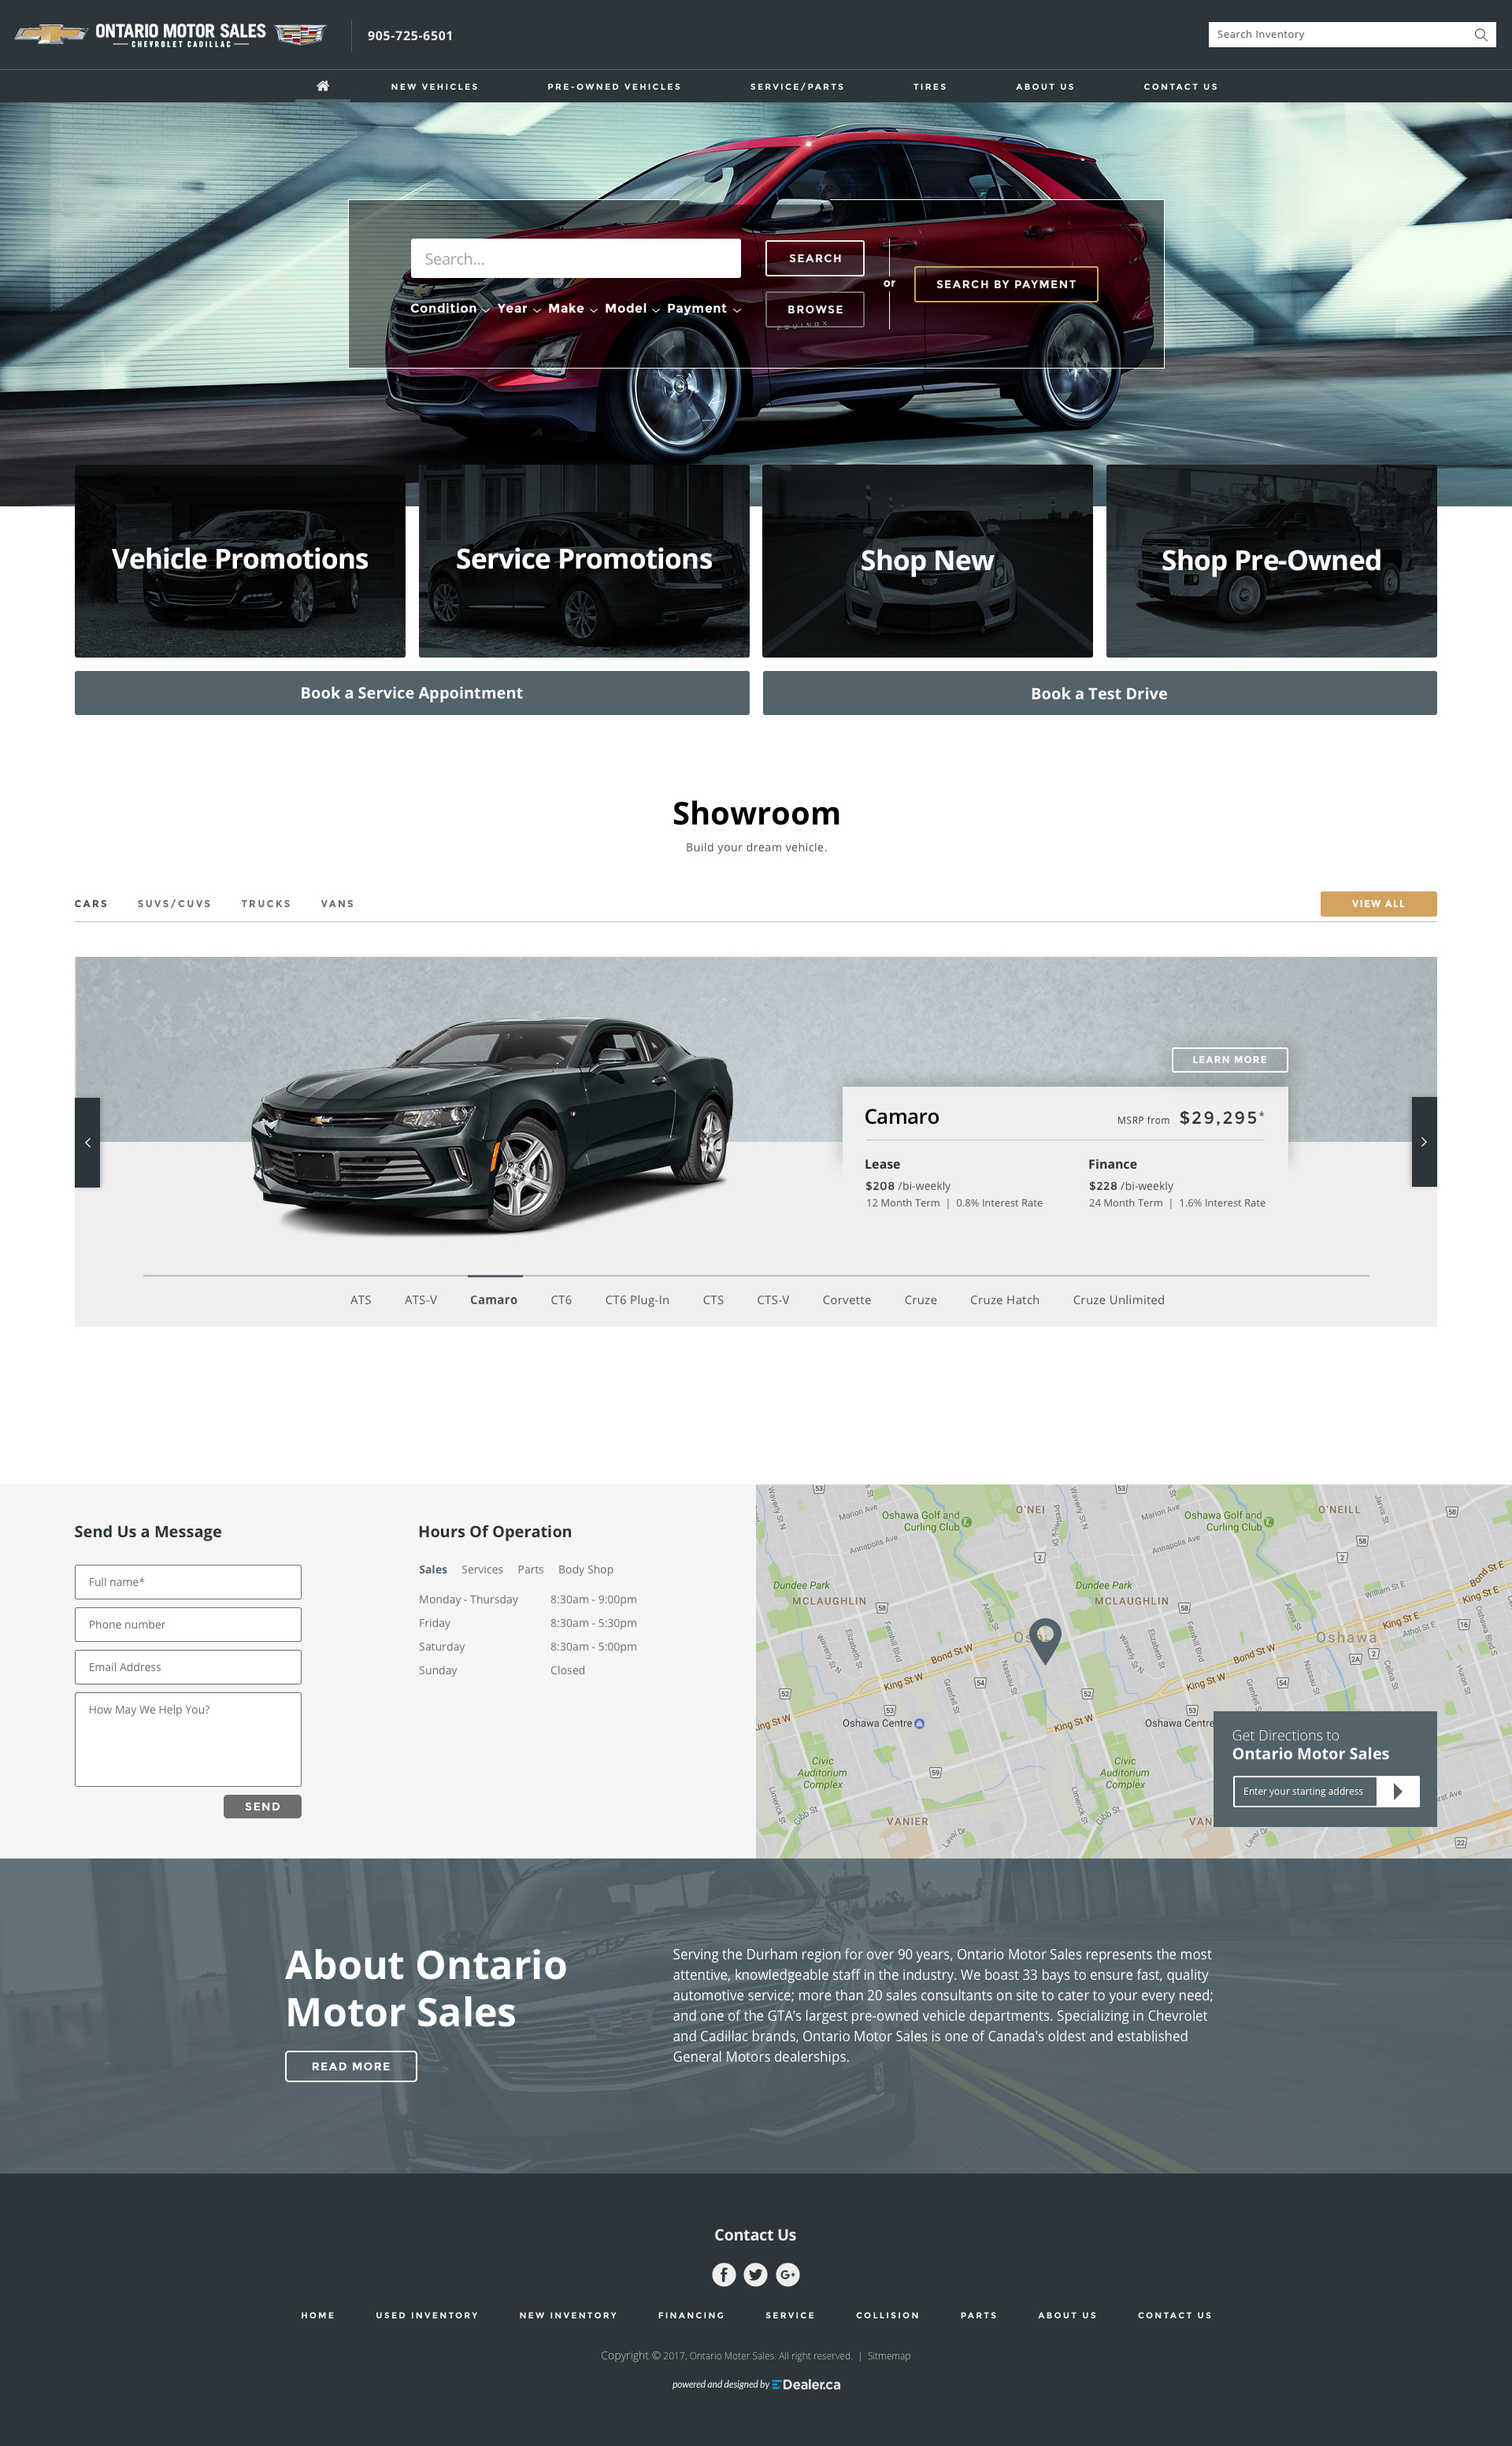 Ontario Motor Sales